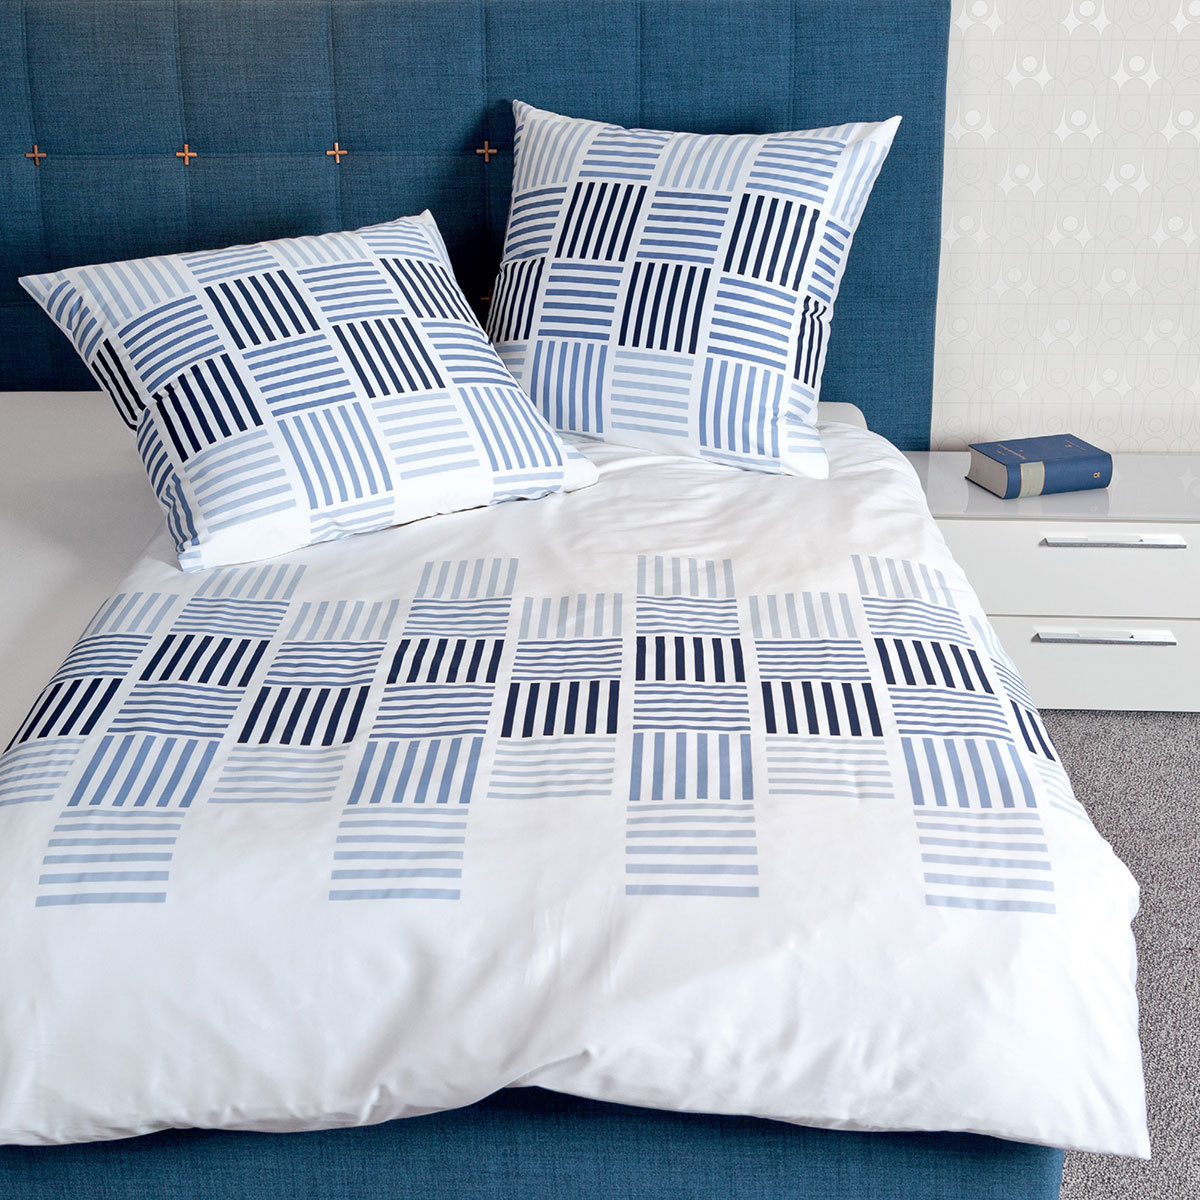 janine mako satin bettw sche j d 87025 02 blau g nstig. Black Bedroom Furniture Sets. Home Design Ideas